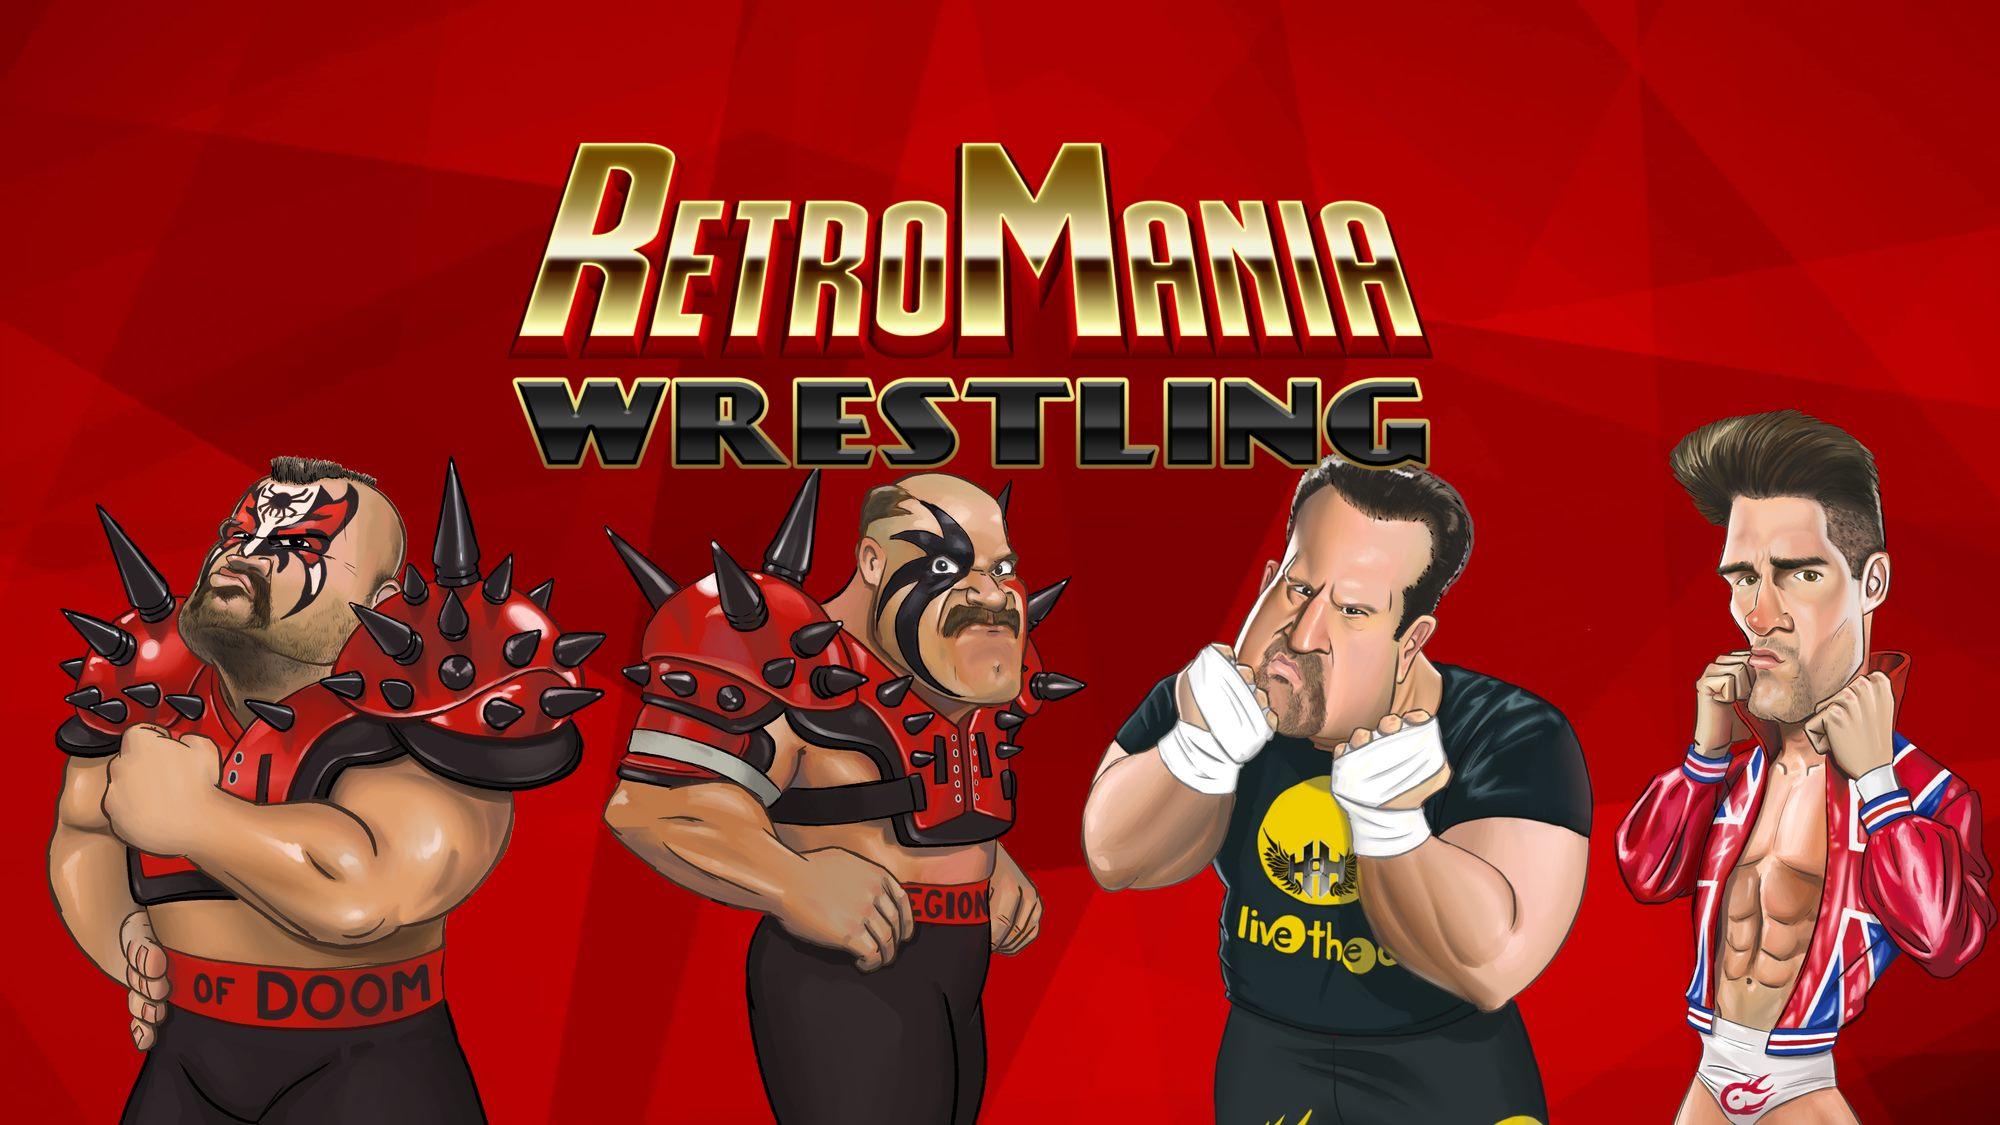 retromania-wrestling-fighters.jpg